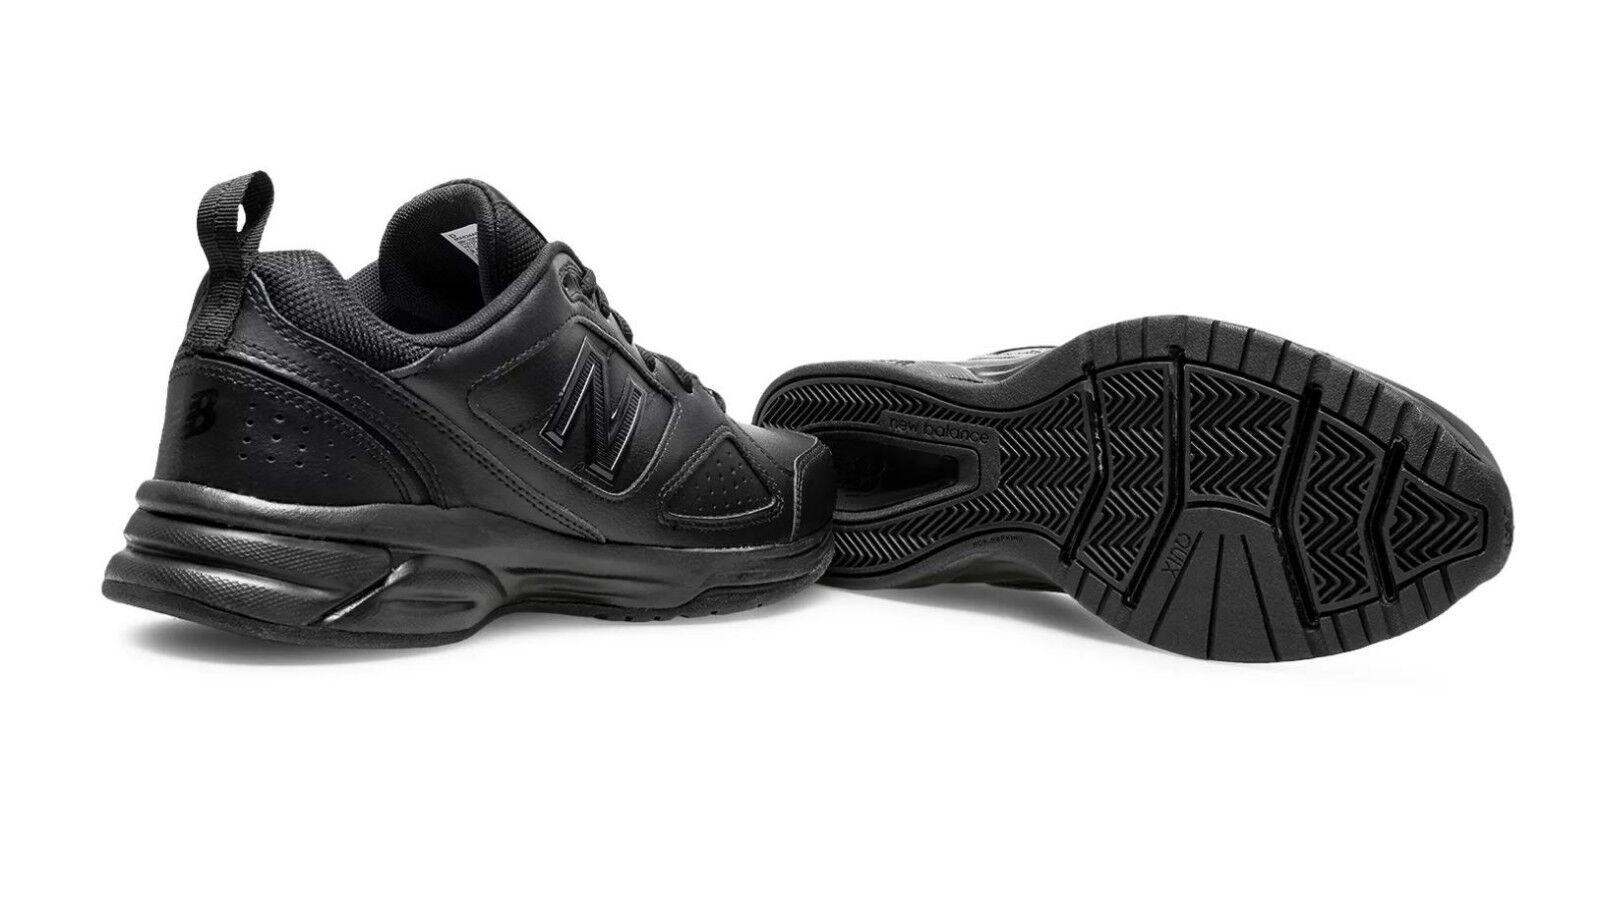 New Balance MX624AB Mens Crosstraining shoes (Black) (2E)